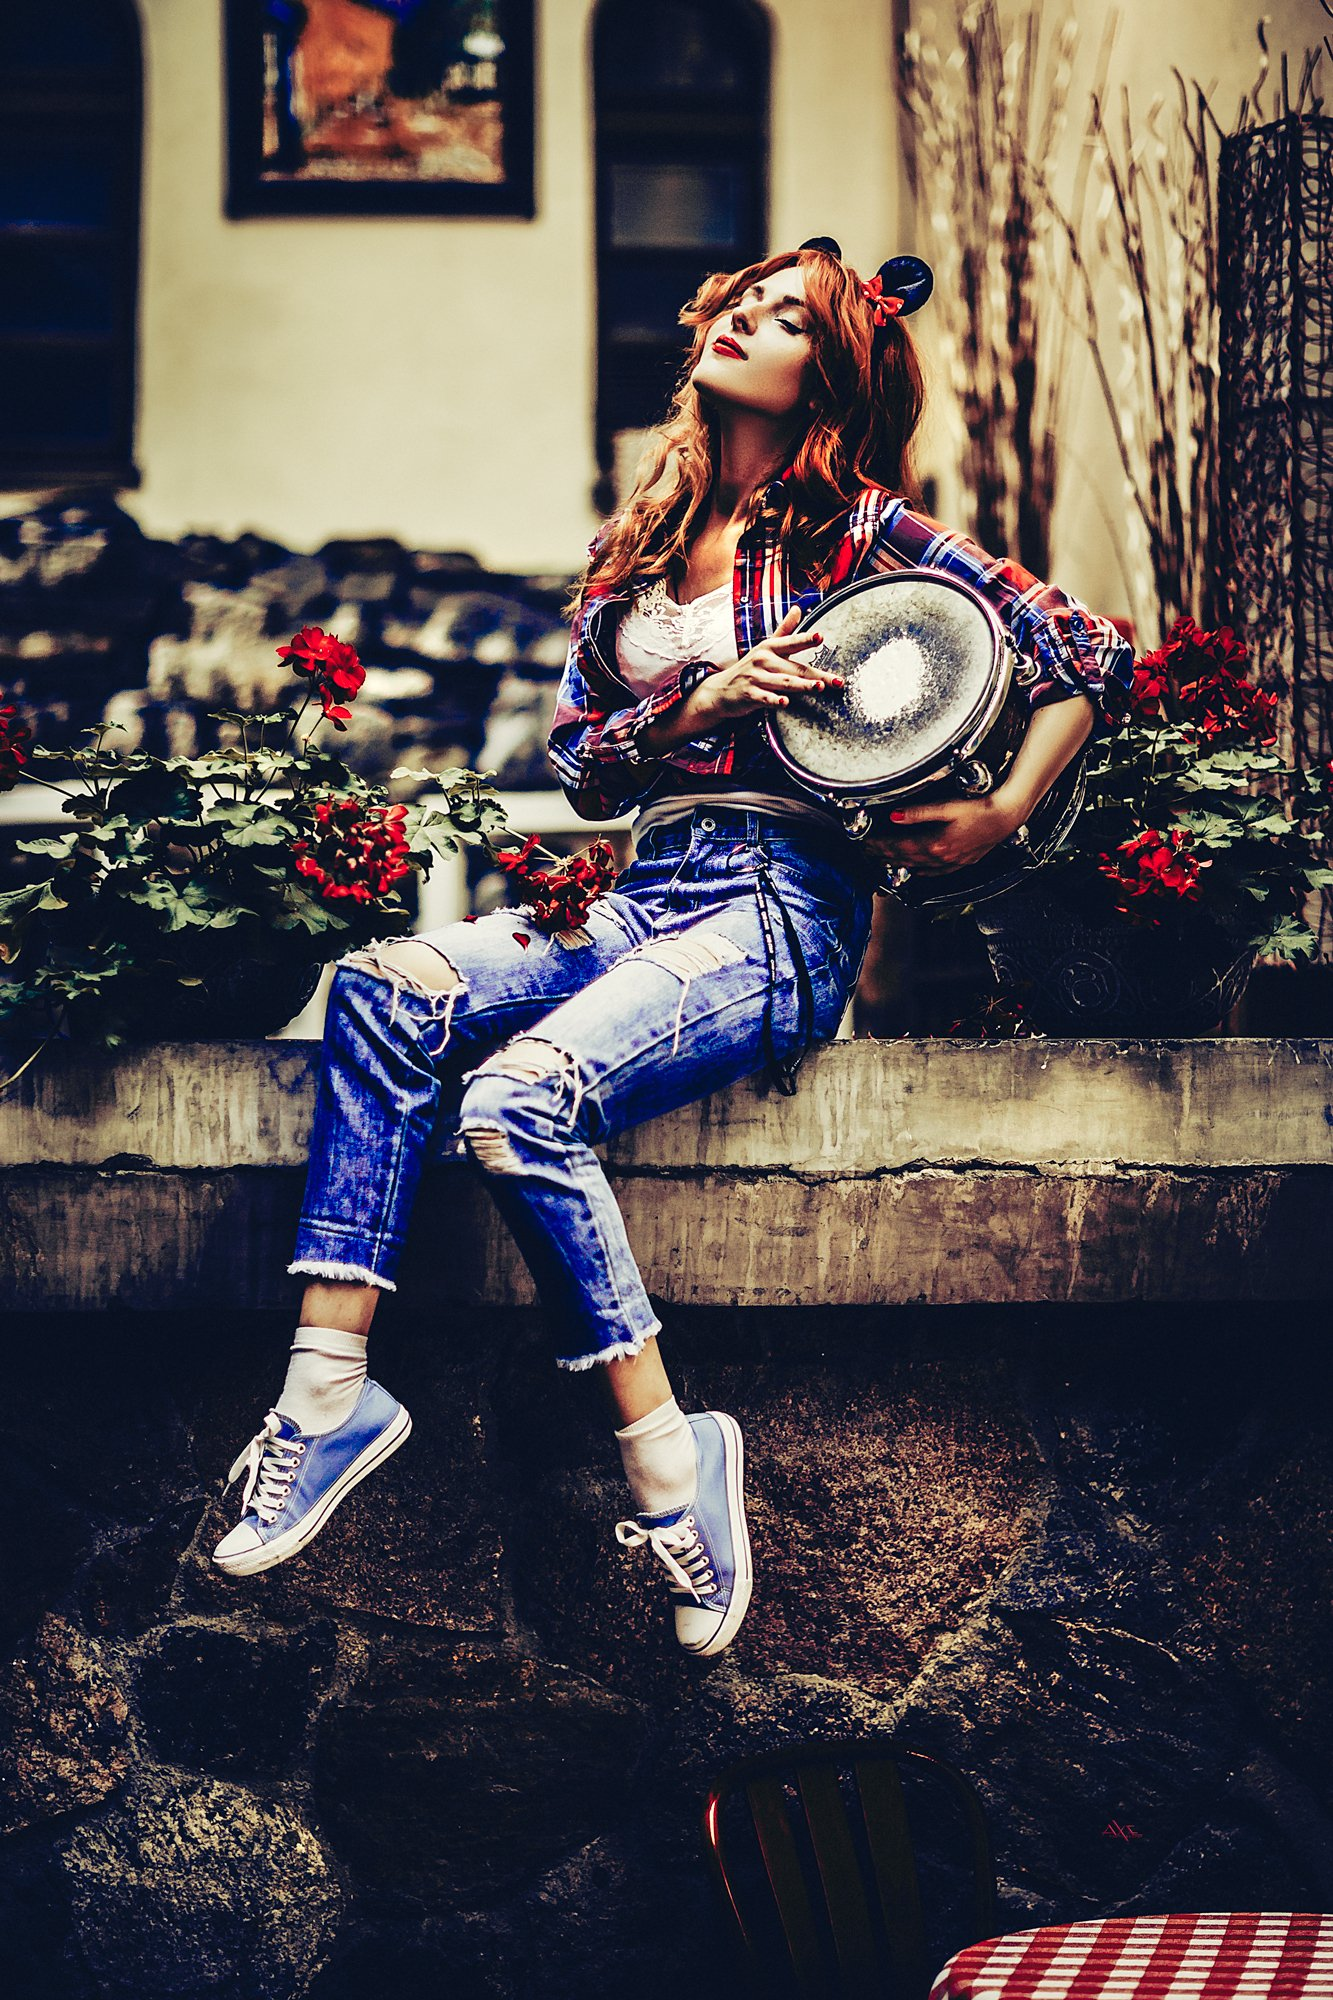 woman, portrait, art, beauty, natural light, pin-up, fashion, Руслан Болгов (Axe)